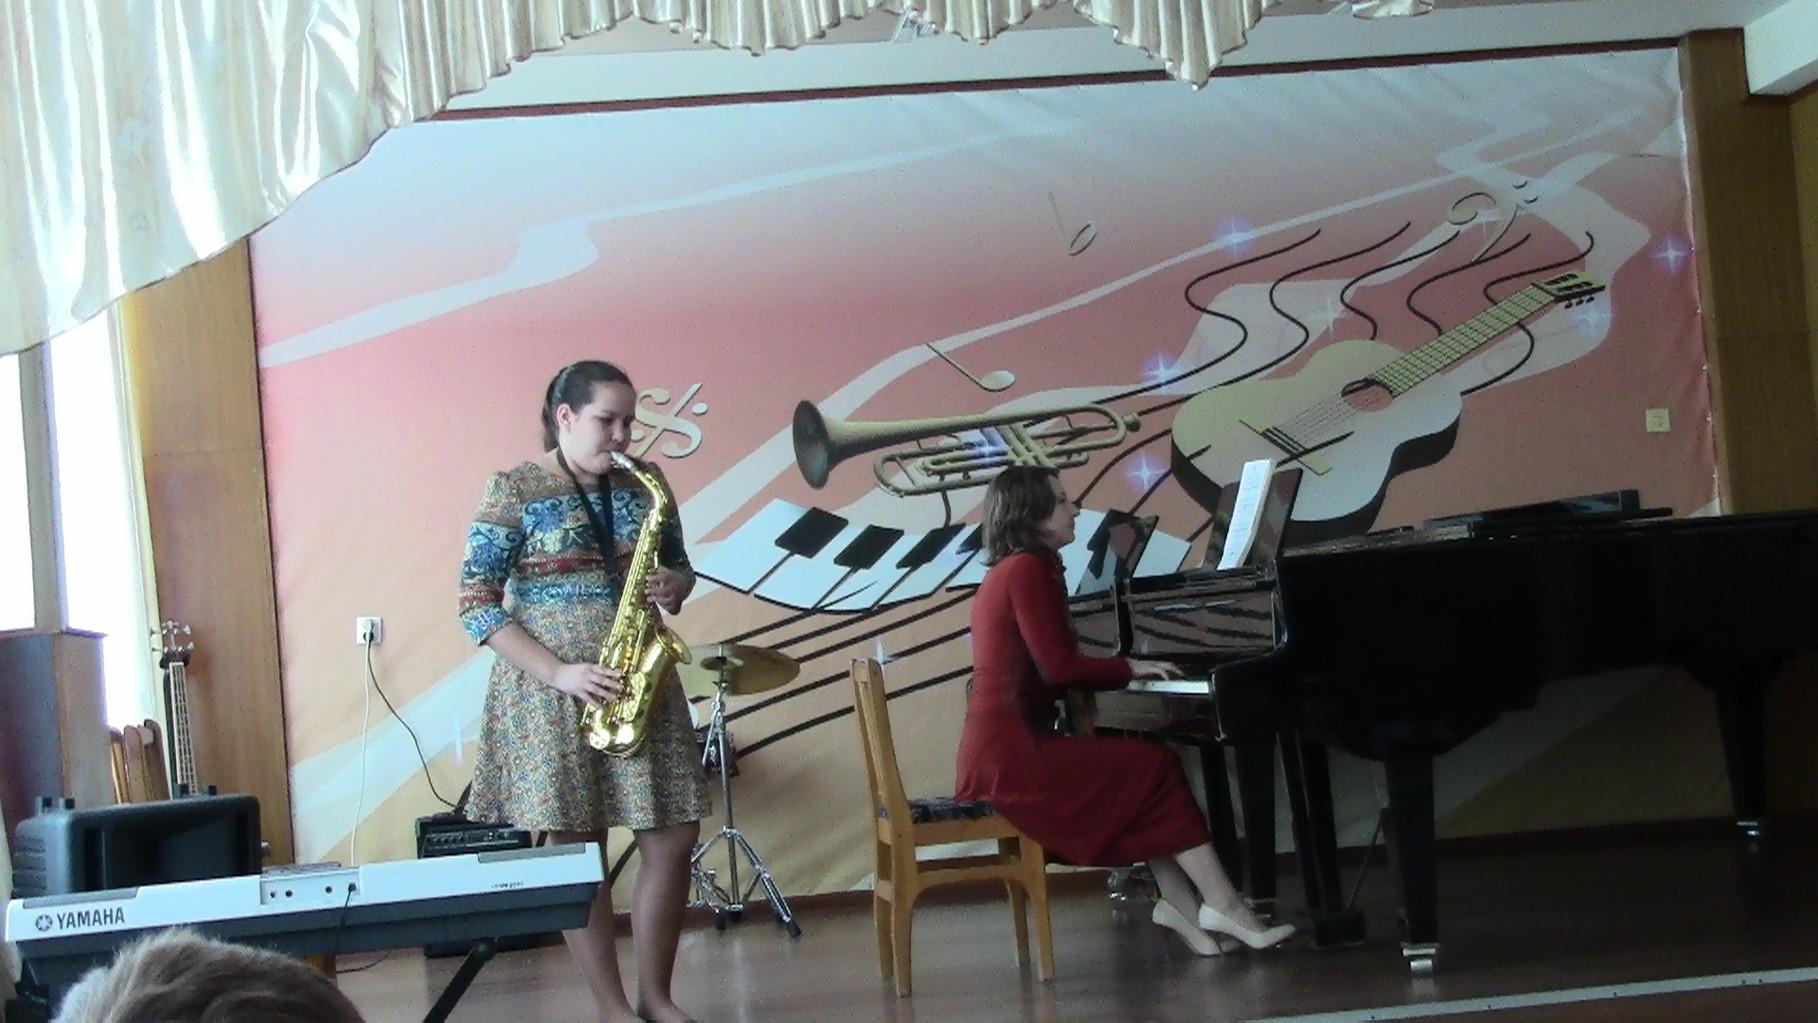 Кунакбаева Луиза (саксофон) и концертмейстер Абросимова Марина Юрьевна